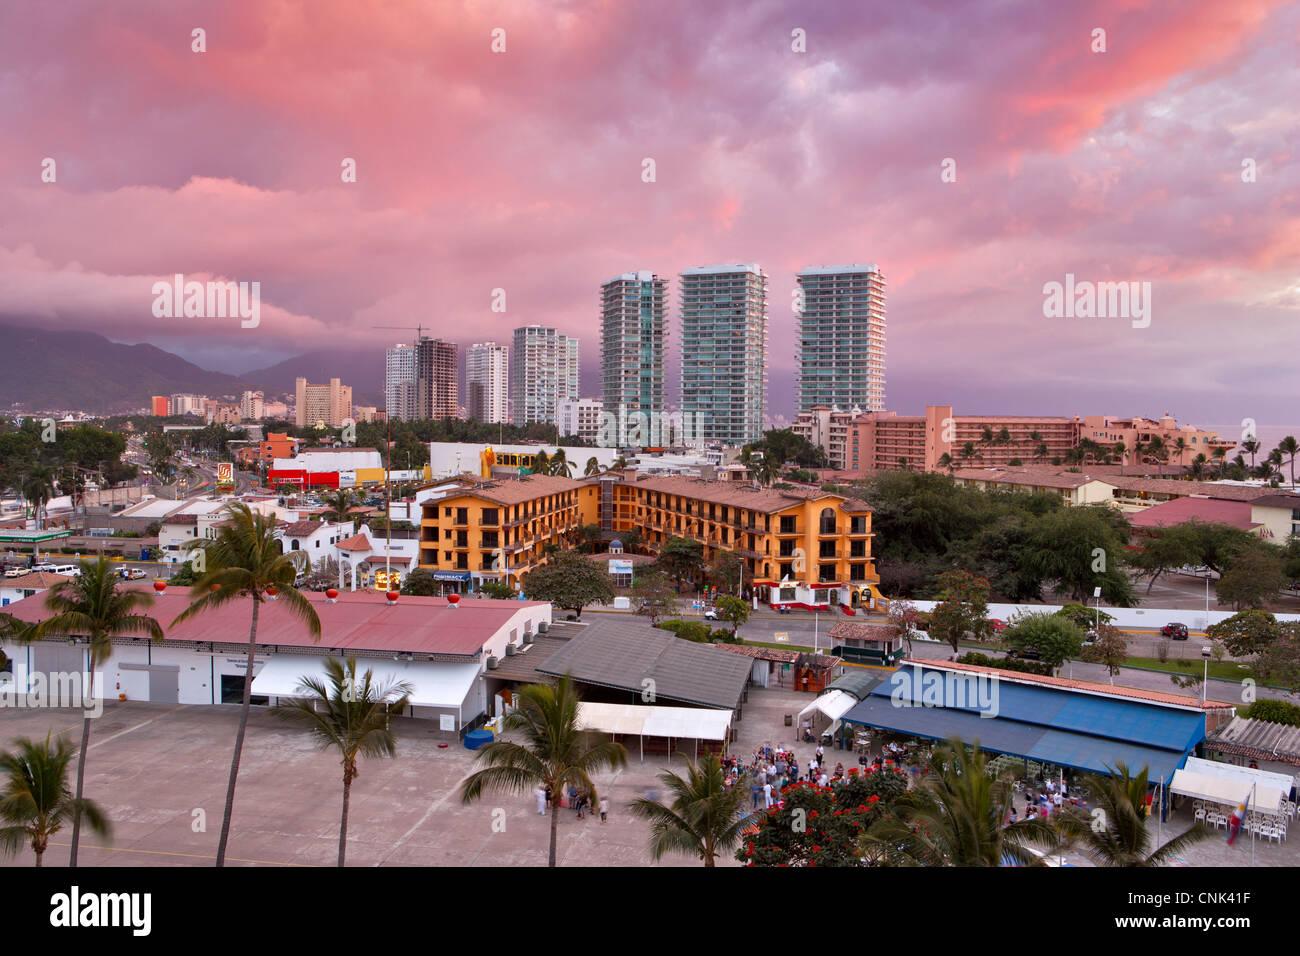 Puerto Sunset Stock Photos Amp Puerto Sunset Stock Images Alamy